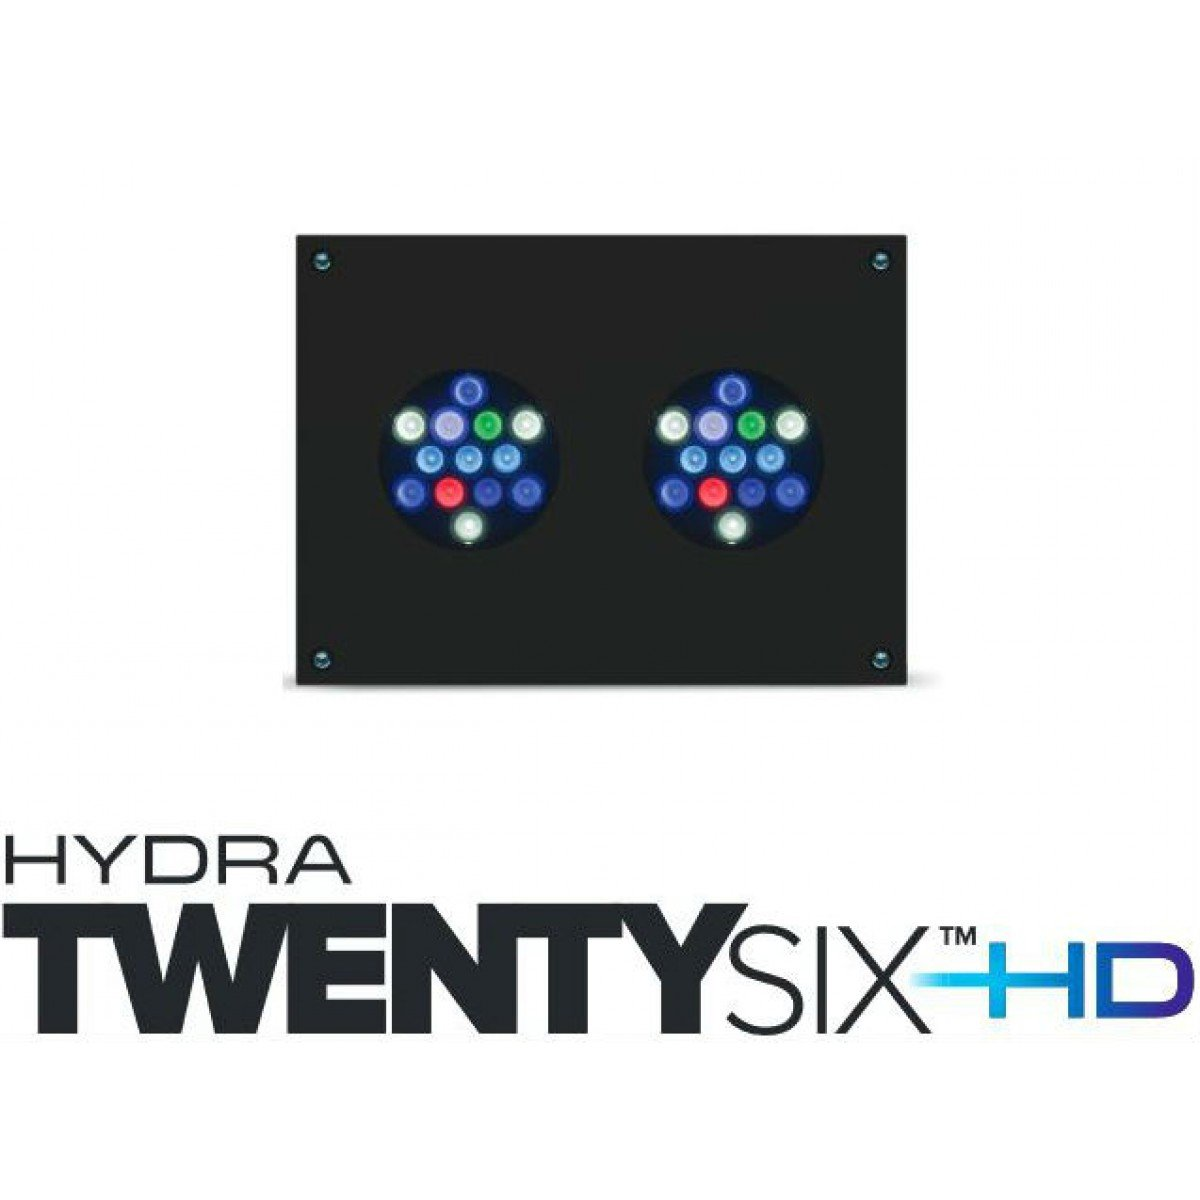 Amazon.com  AquaIllumination Hydra TwentySix +HD LED Light Black  Pet Supplies  sc 1 st  Amazon.com & Amazon.com : AquaIllumination Hydra TwentySix +HD LED Light Black ... azcodes.com